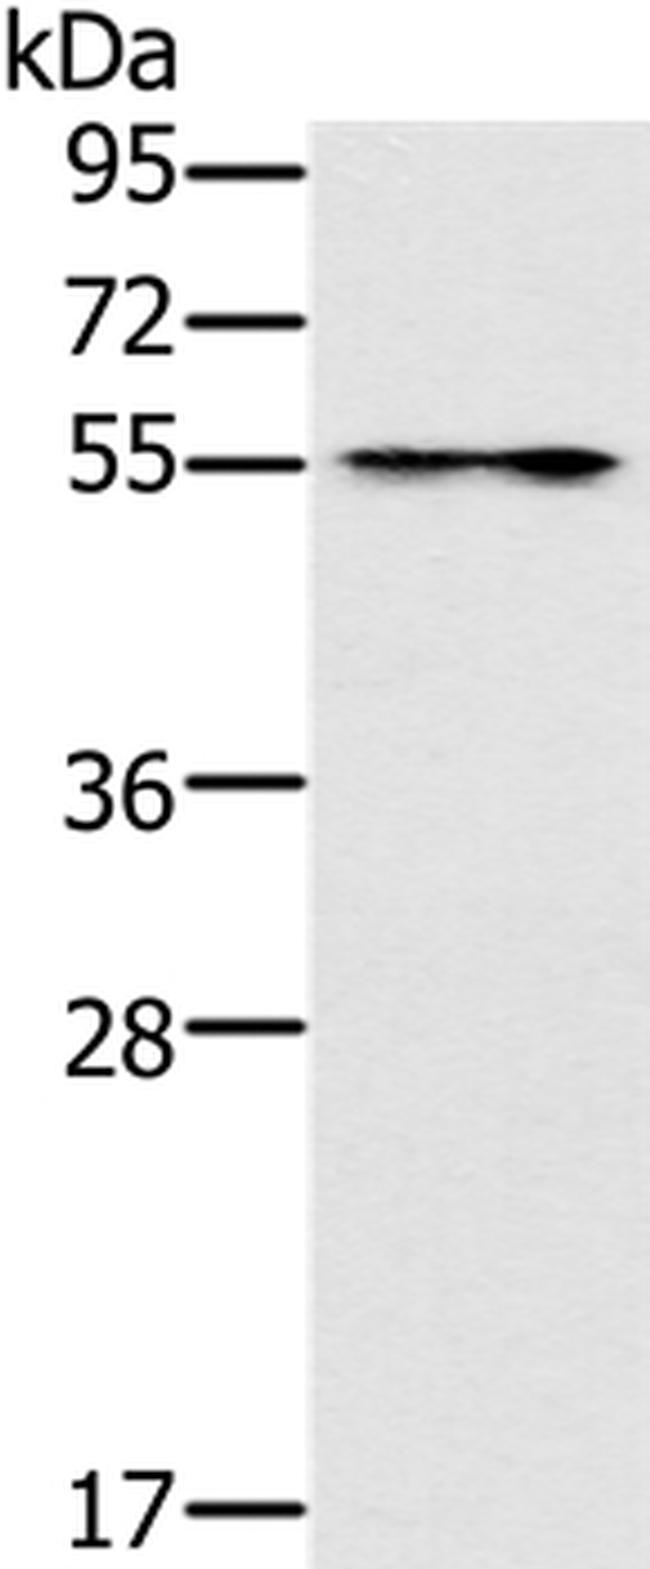 PUS10 Antibody in Western Blot (WB)